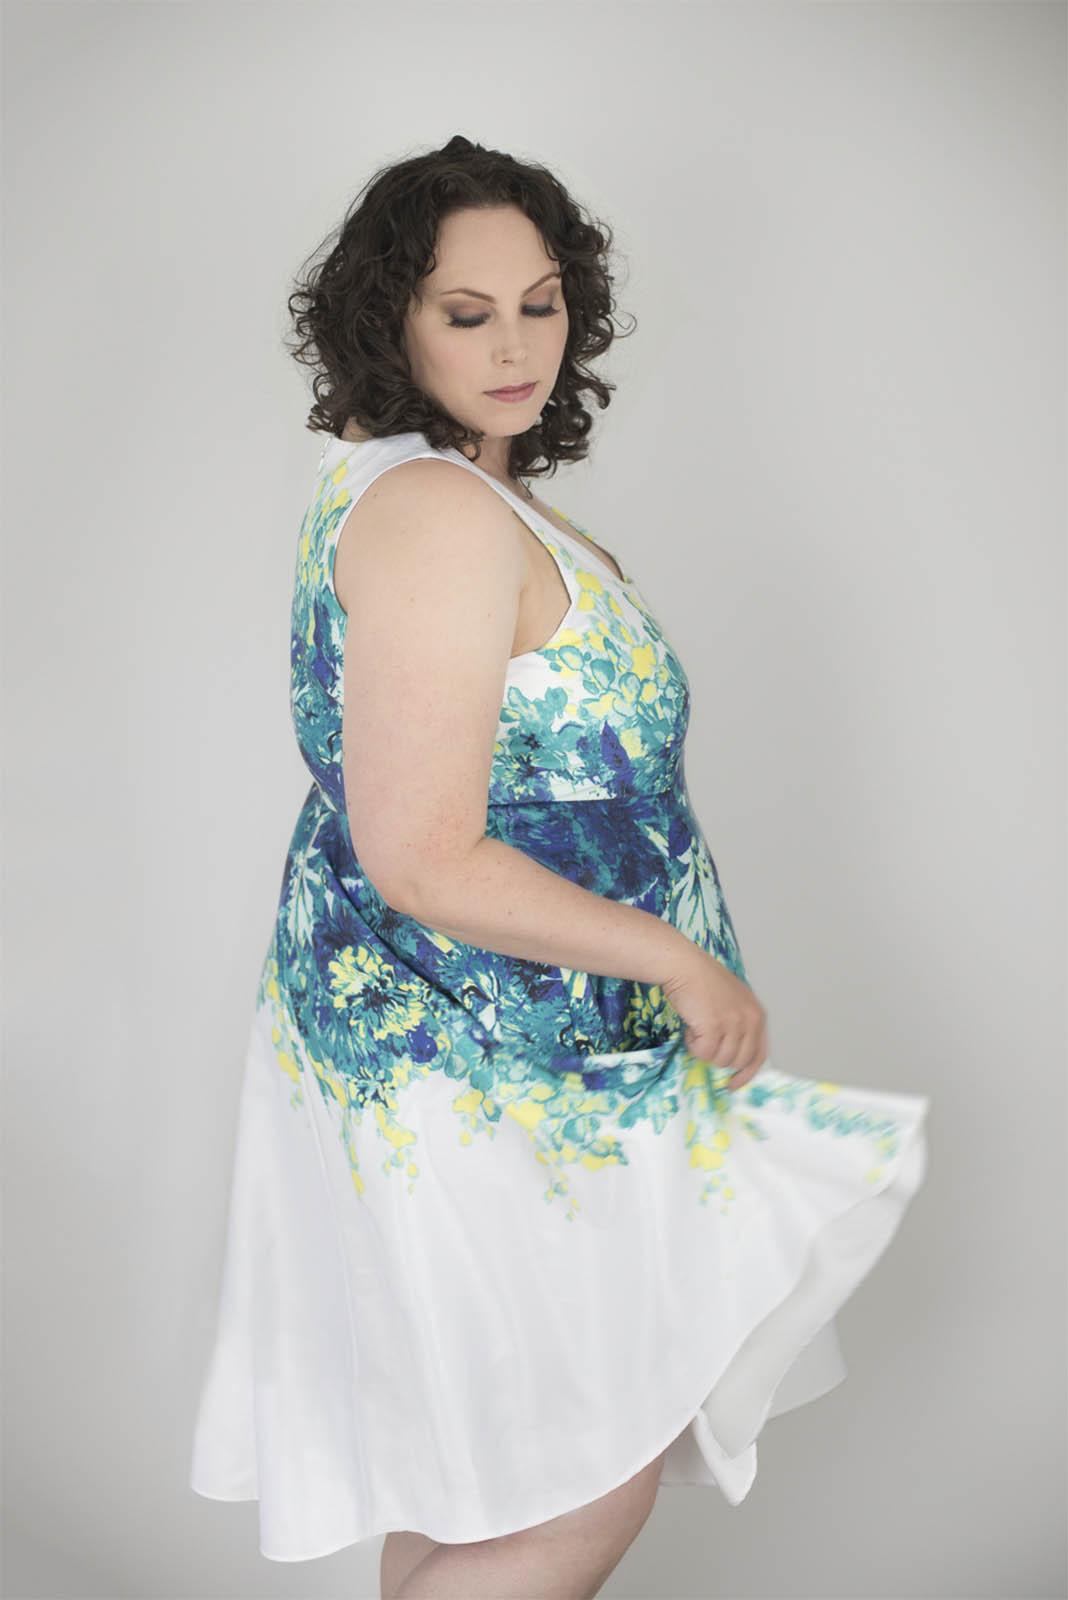 Chelsey Luren Portraits - Eating Disorder Recovery Photoshoot   Nicole Testimonial5.jpg